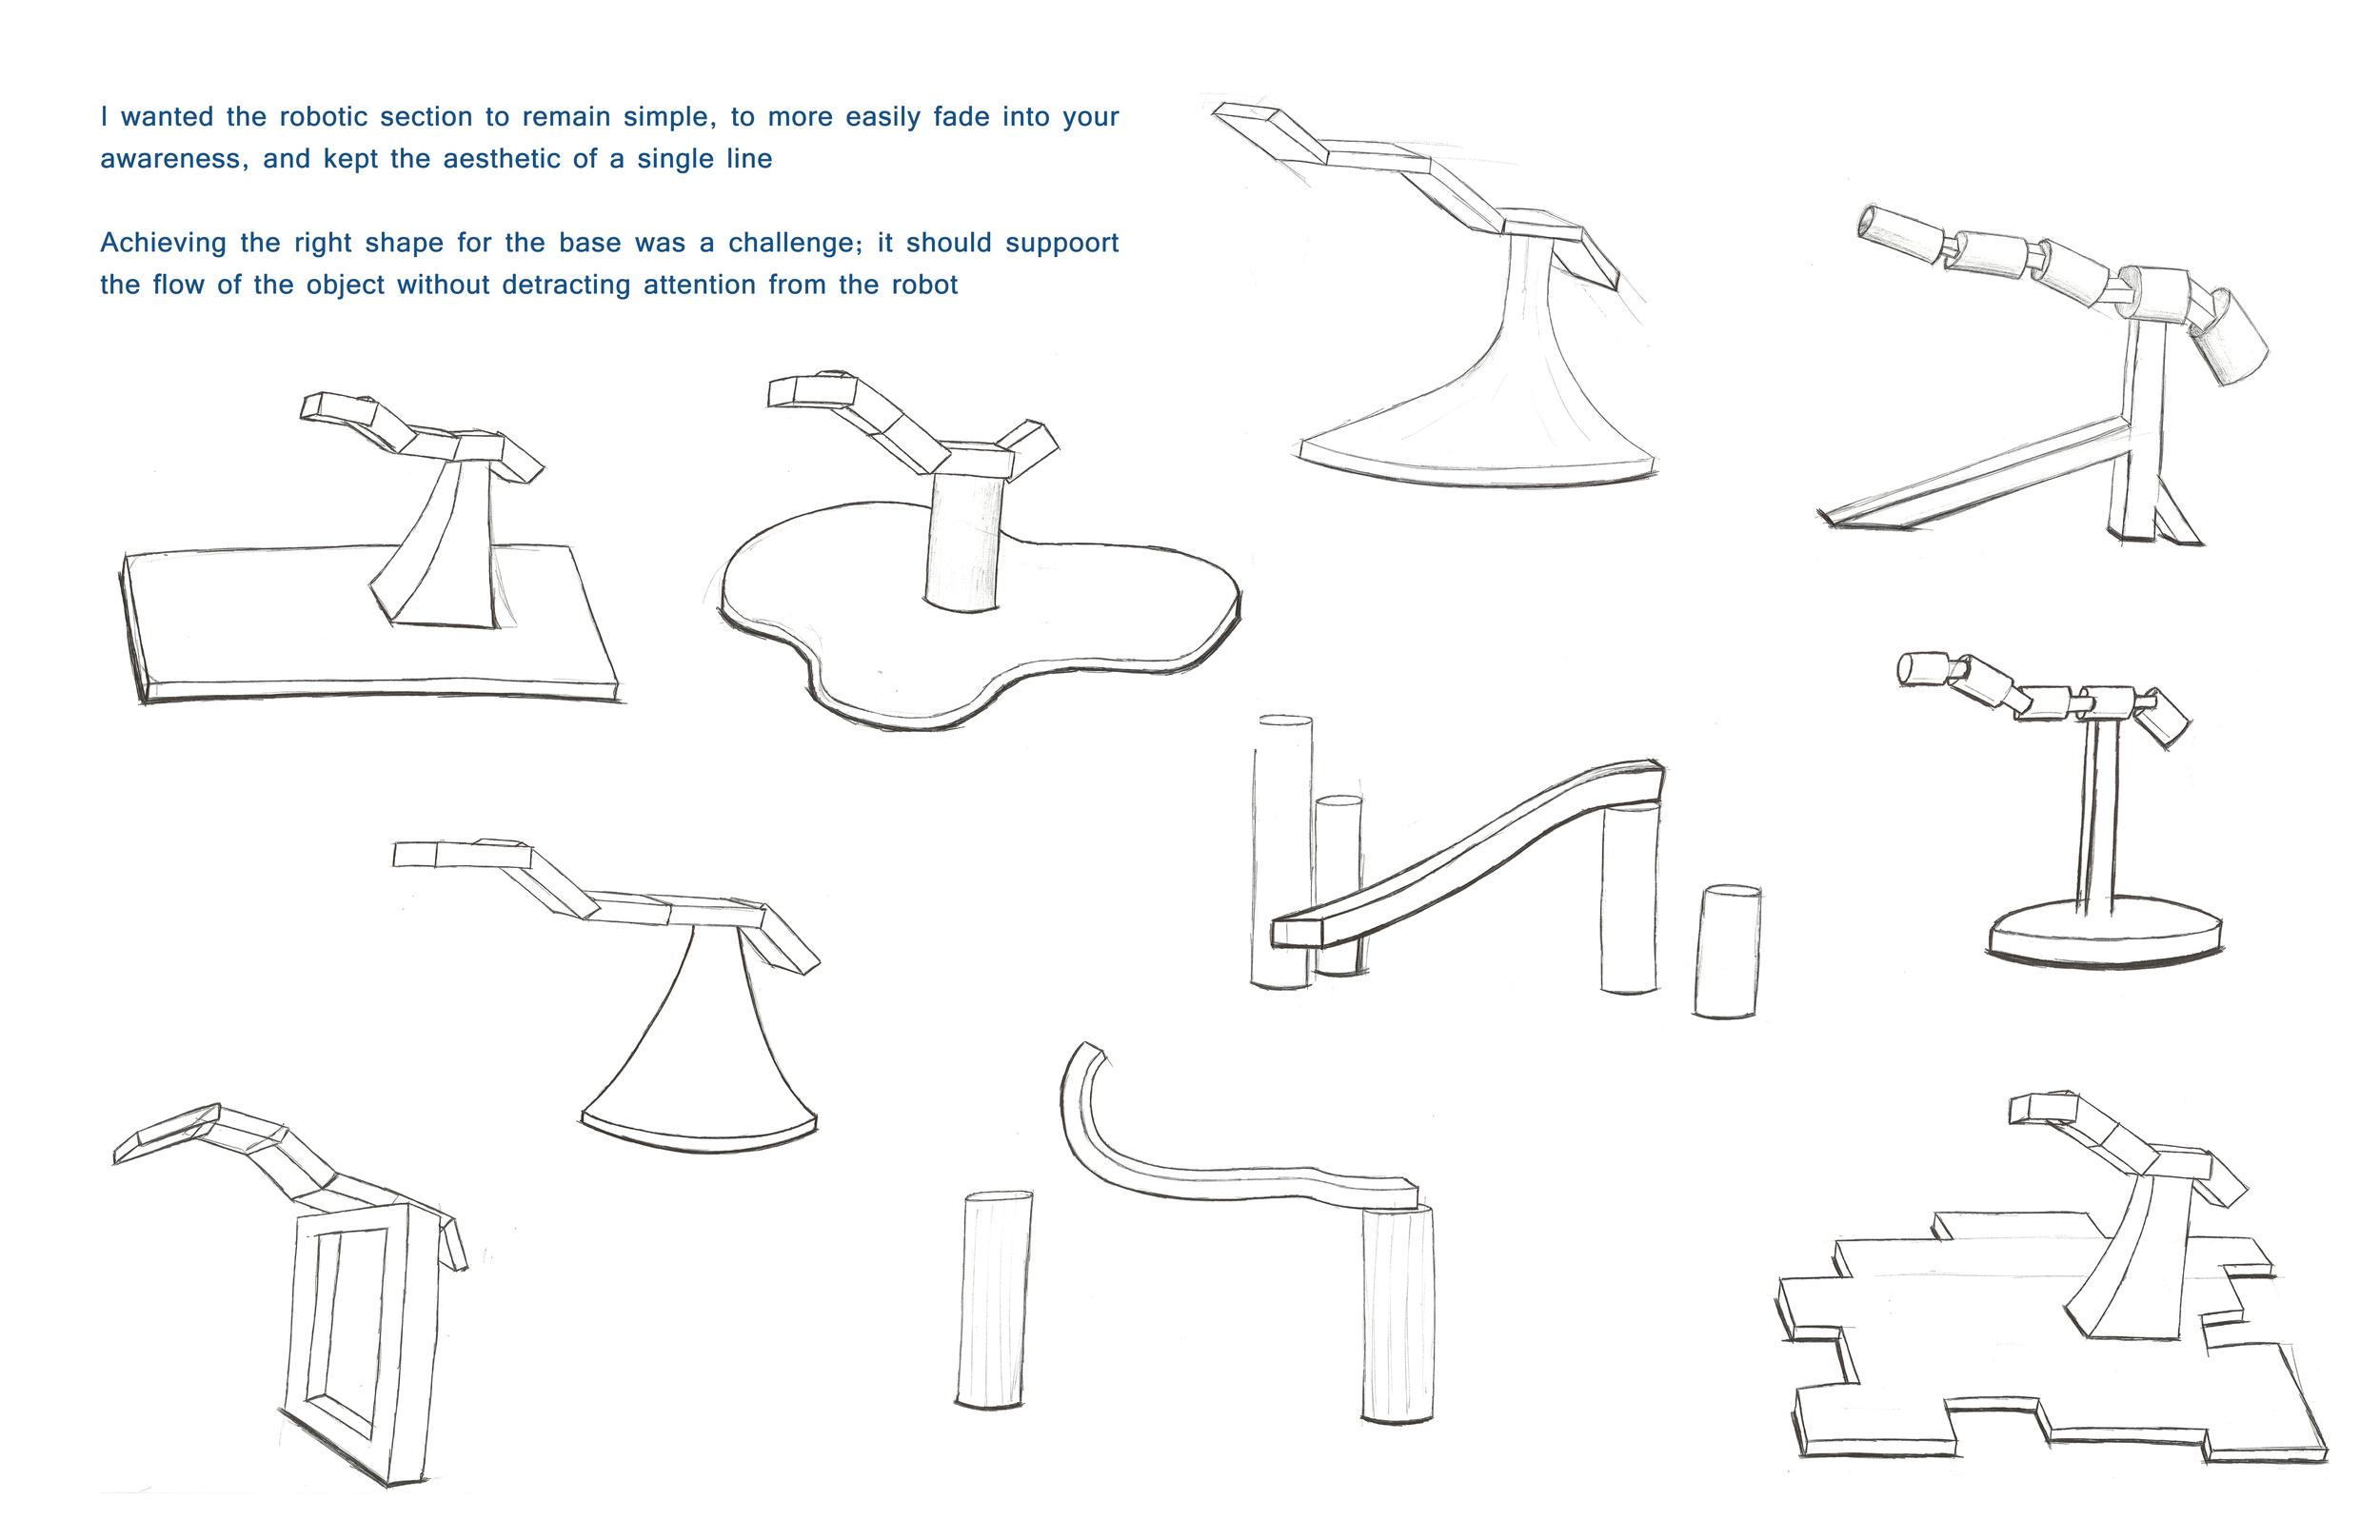 Emotive Robotics sketches Brian Lieb